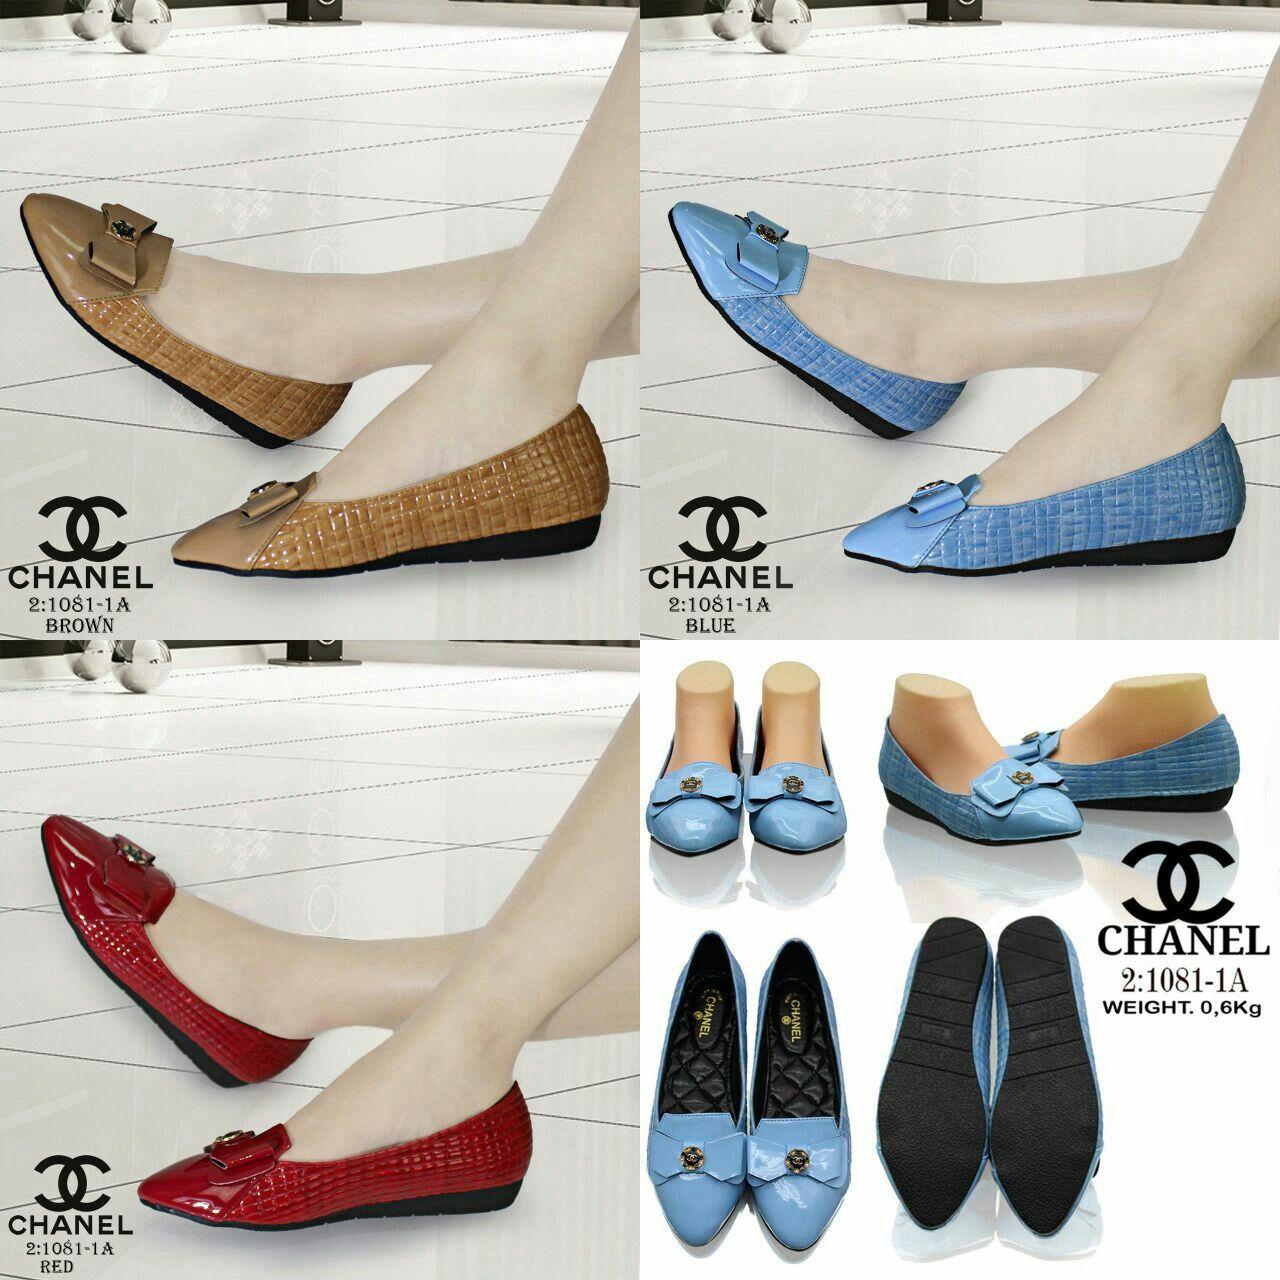 Sepatu Chanel 1081 1a Semprem Bahan Glossy Blue Brown Red